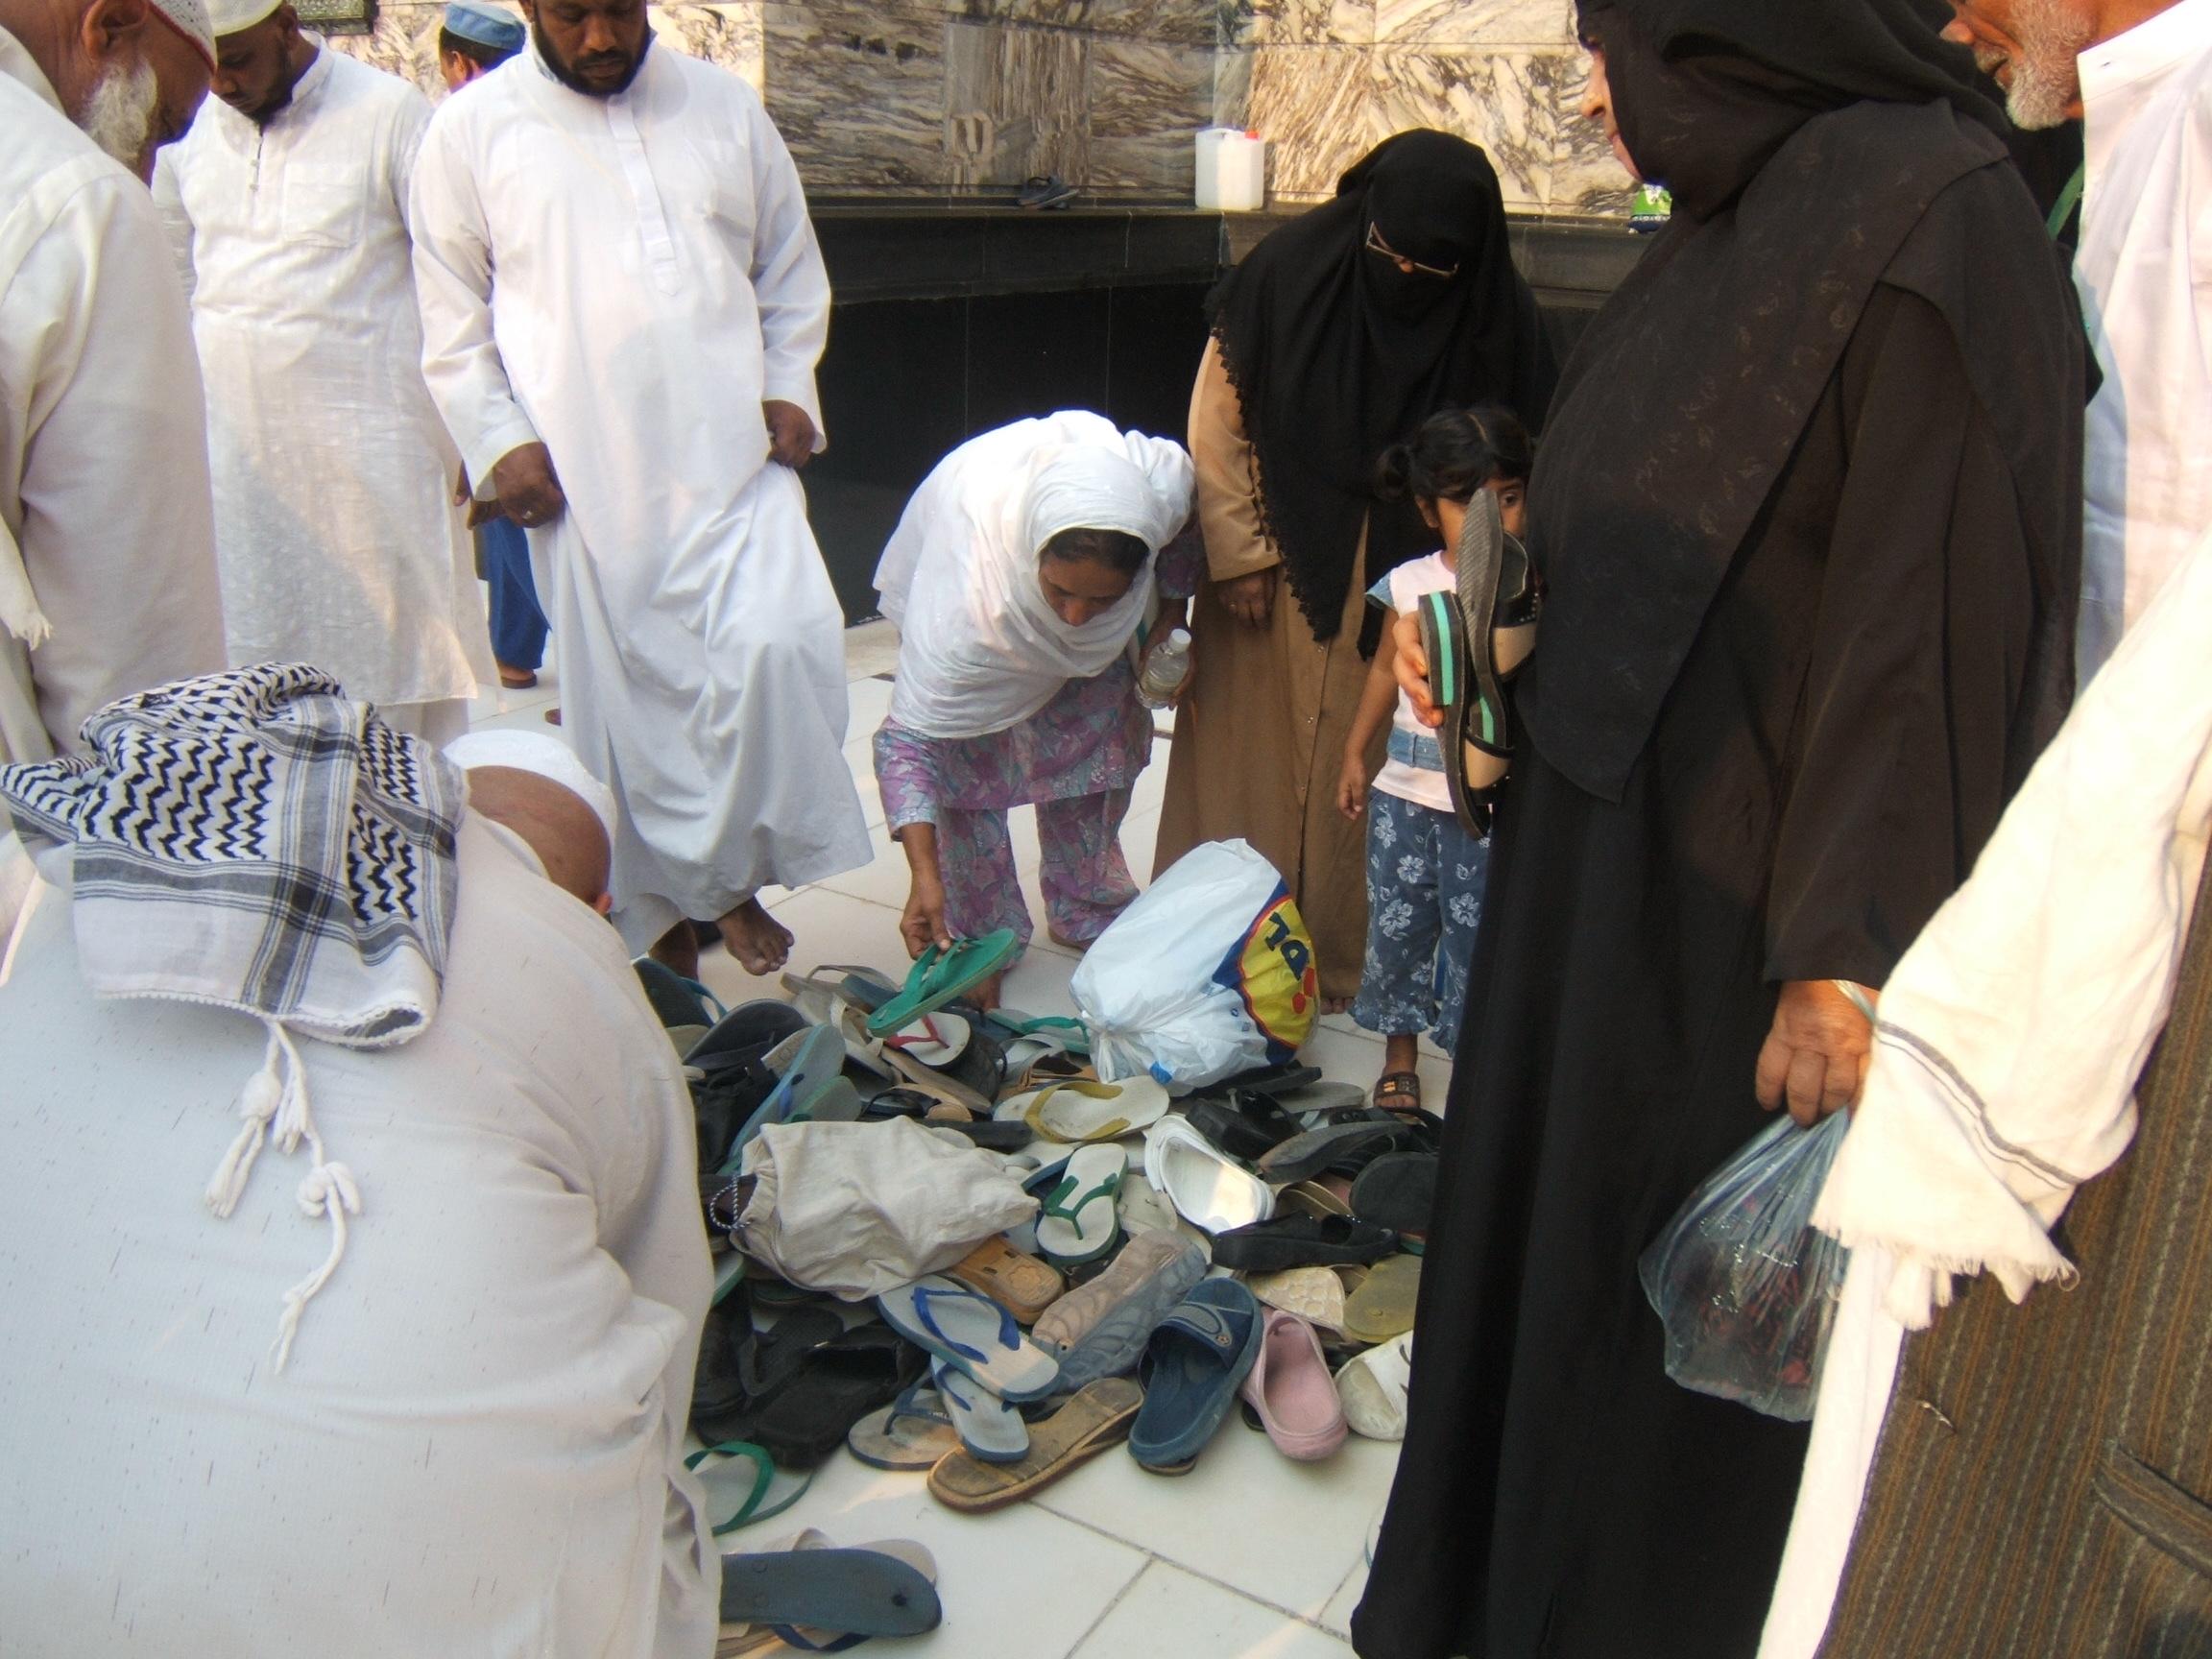 Tumpukan sandal dan alas kaki lainnya berserakan, termasuk yang dibersihkan dan disingkirkan oleh petugas pembersihan, terkadang sandal sandal ini bergelimpangan dan tercecer diareal tawaf.